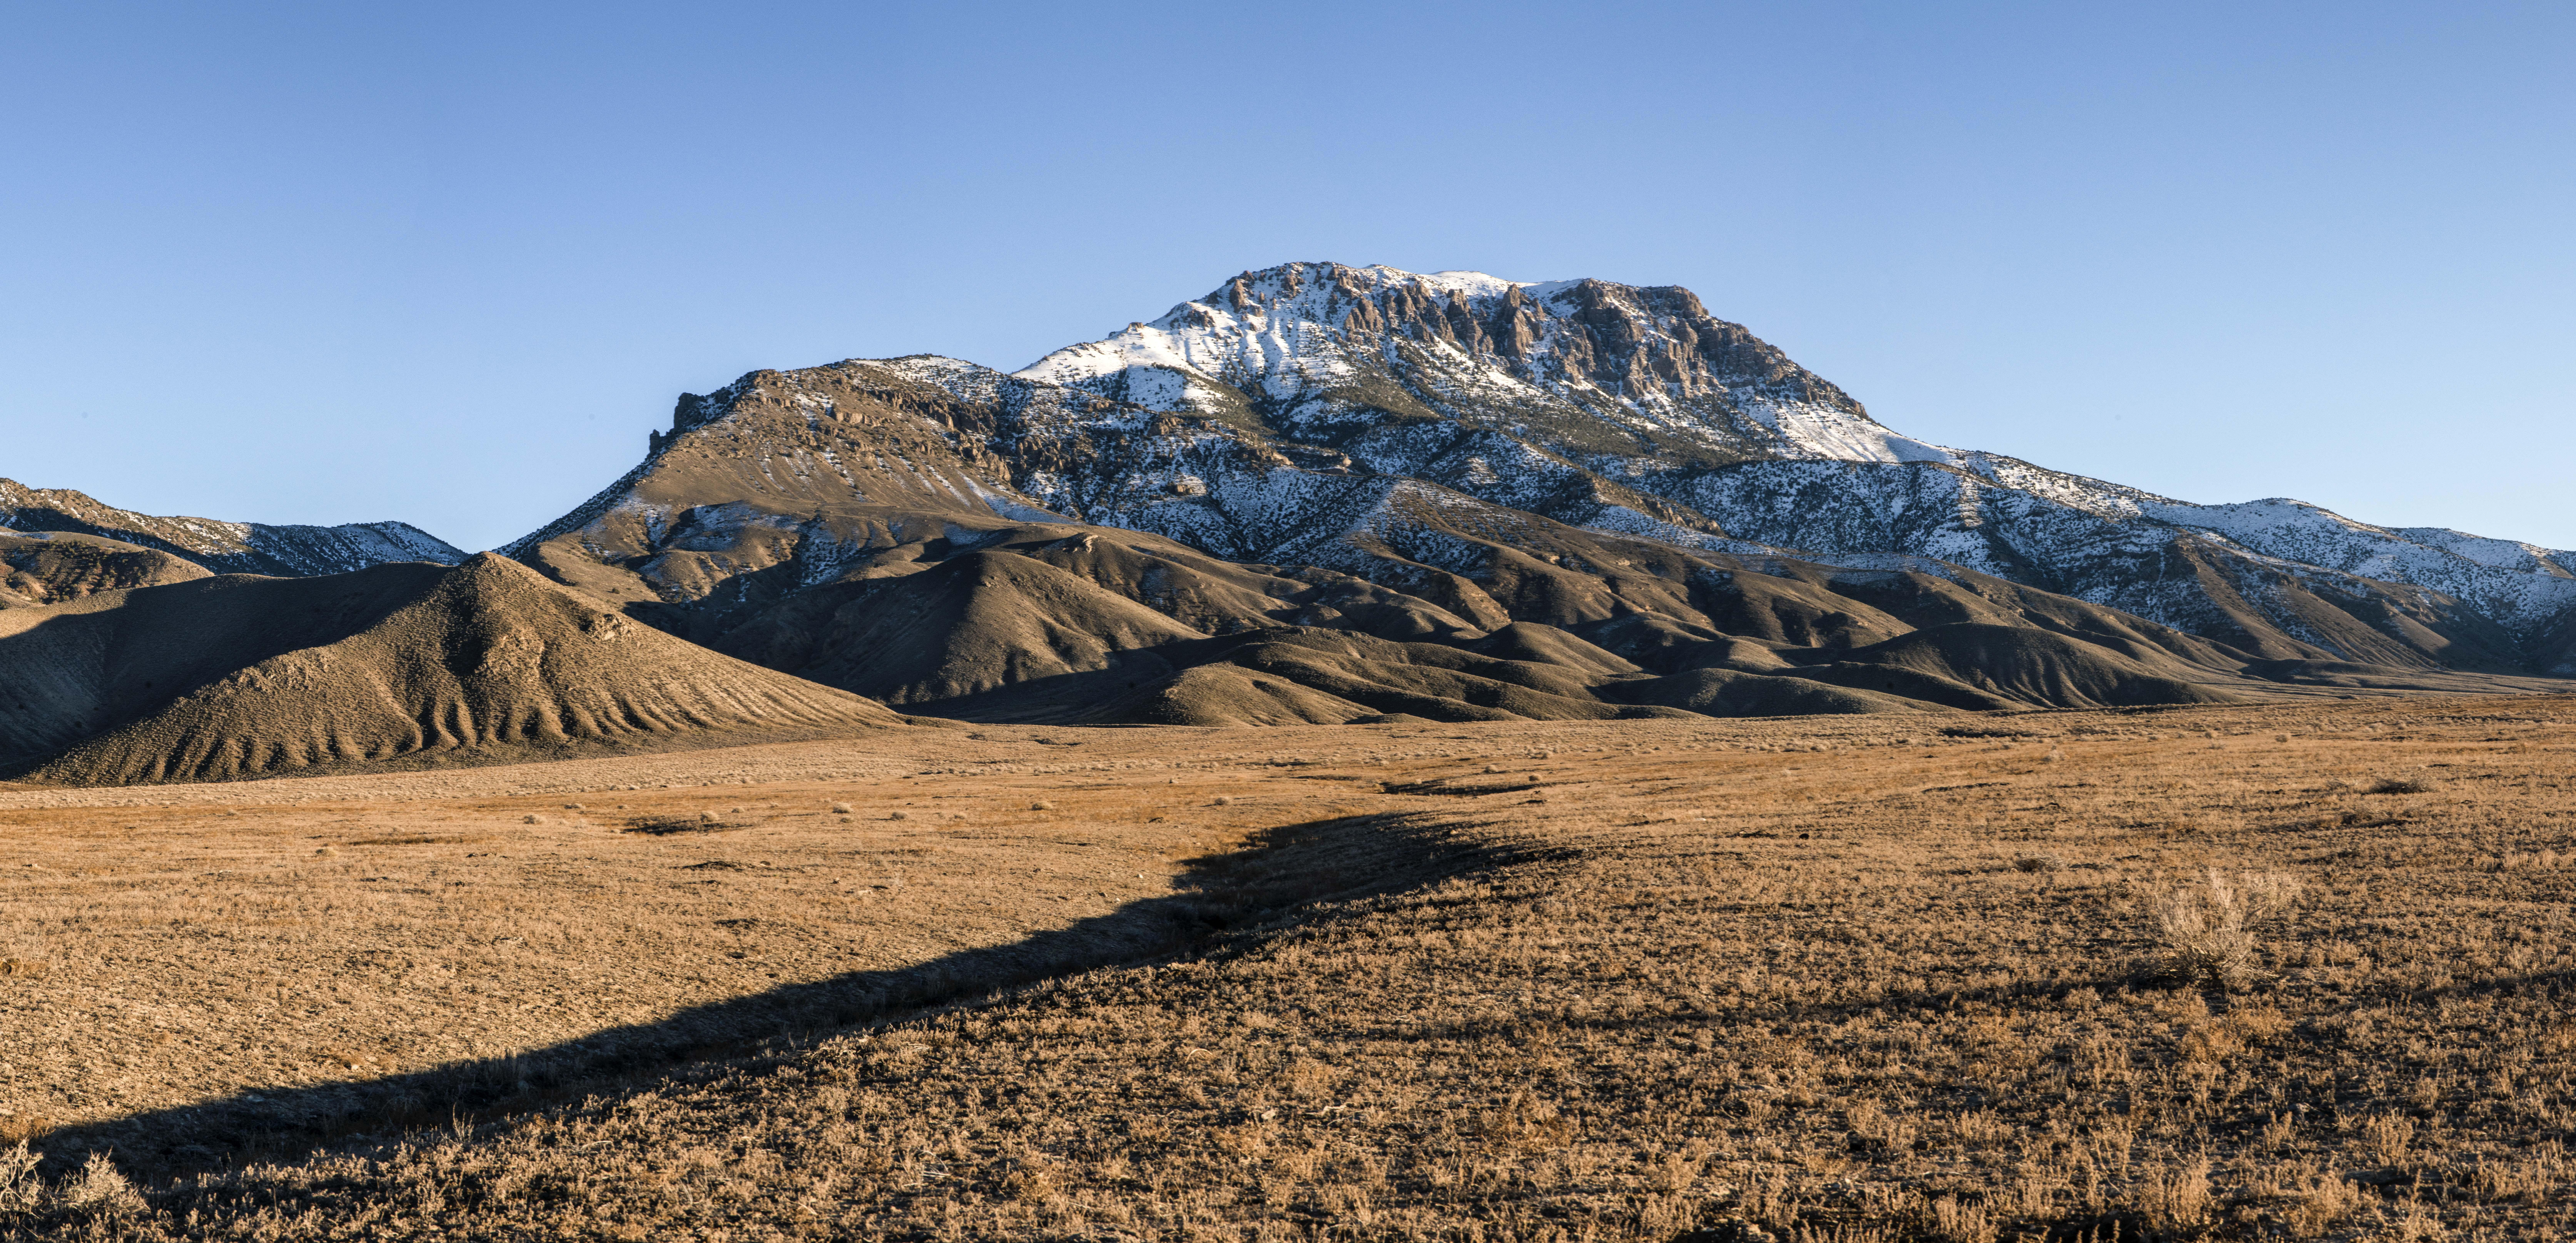 MtAugustaWSA_CaineMt_Panorama1.jpg